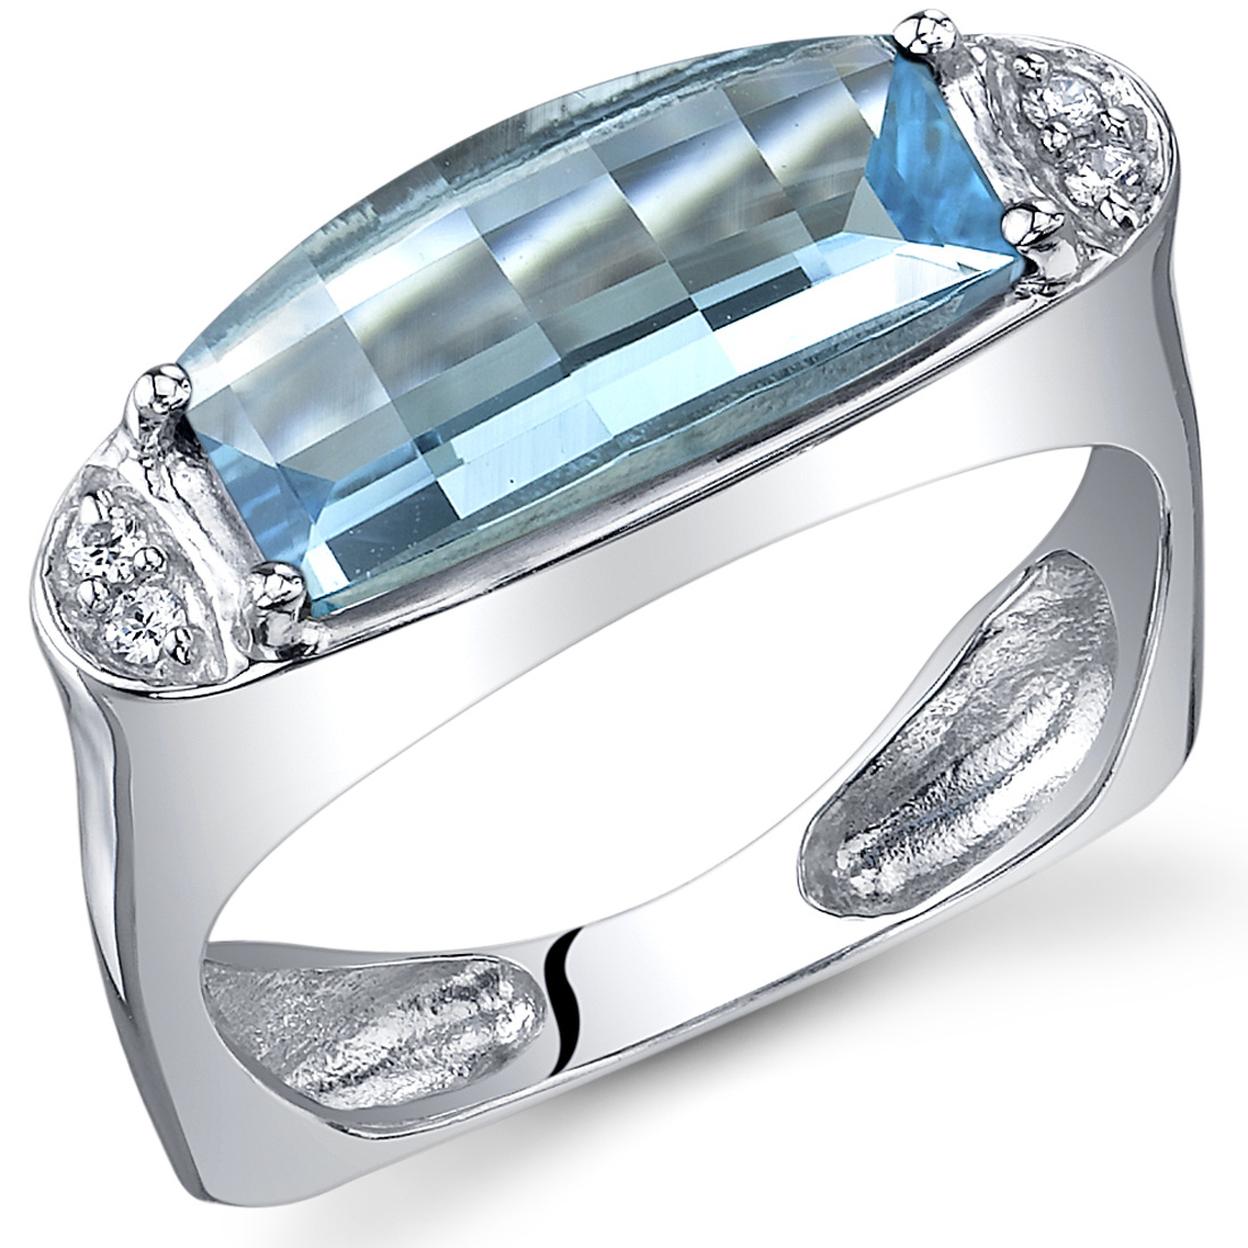 Elizabeth Cole Jewelry - Sabella Ring